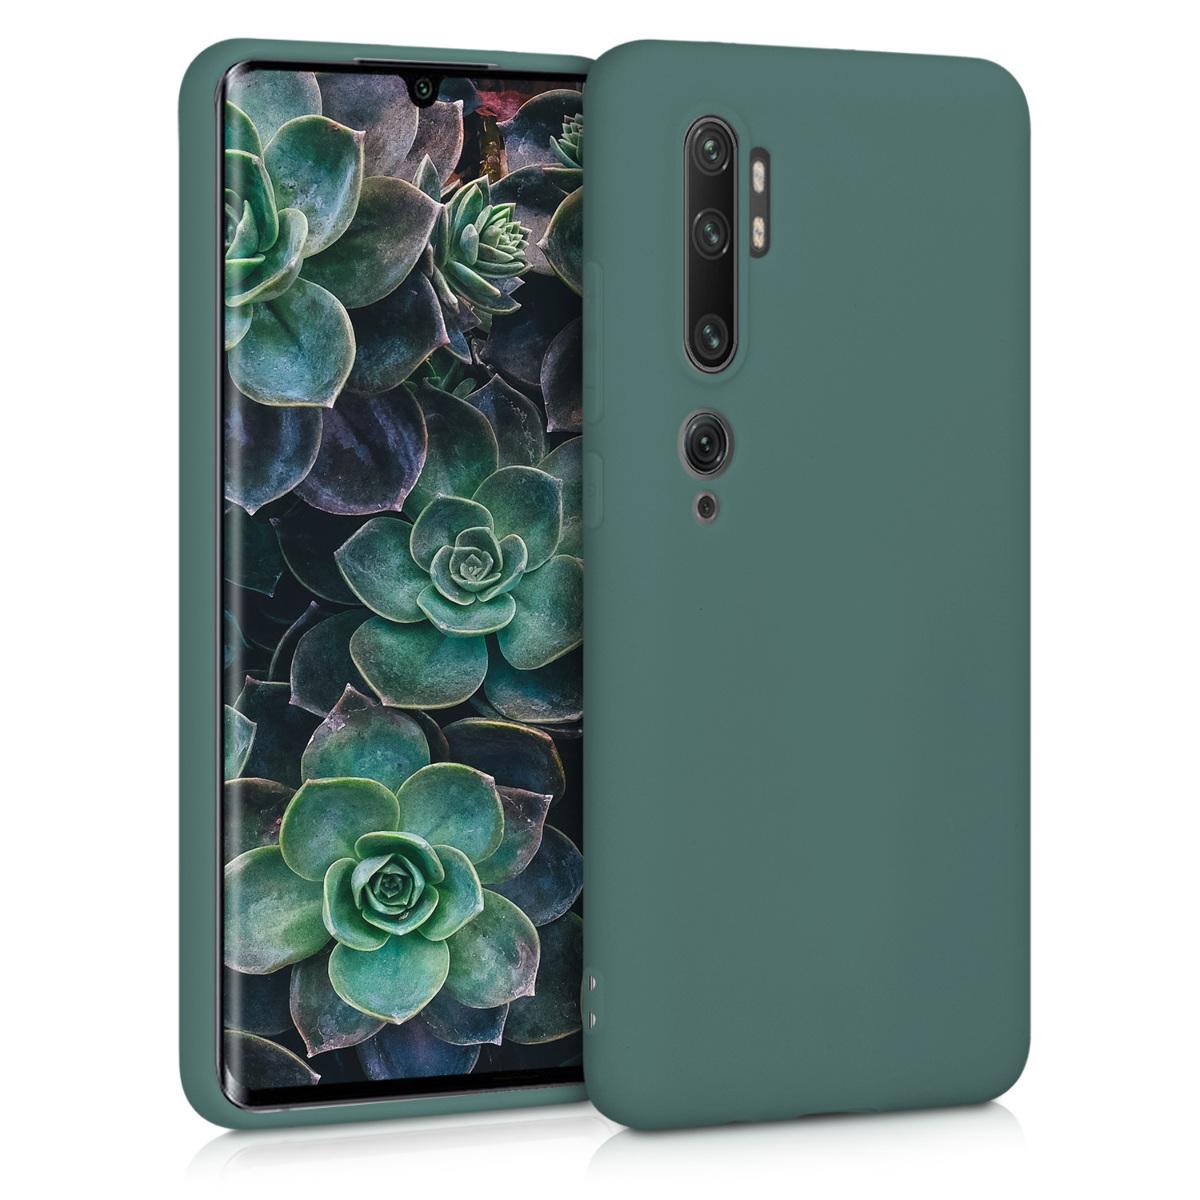 KW Θήκη Σιλικόνης Xiaomi Mi Note 10 / Mi Note 10 Pro - Blue Green (50948.171)